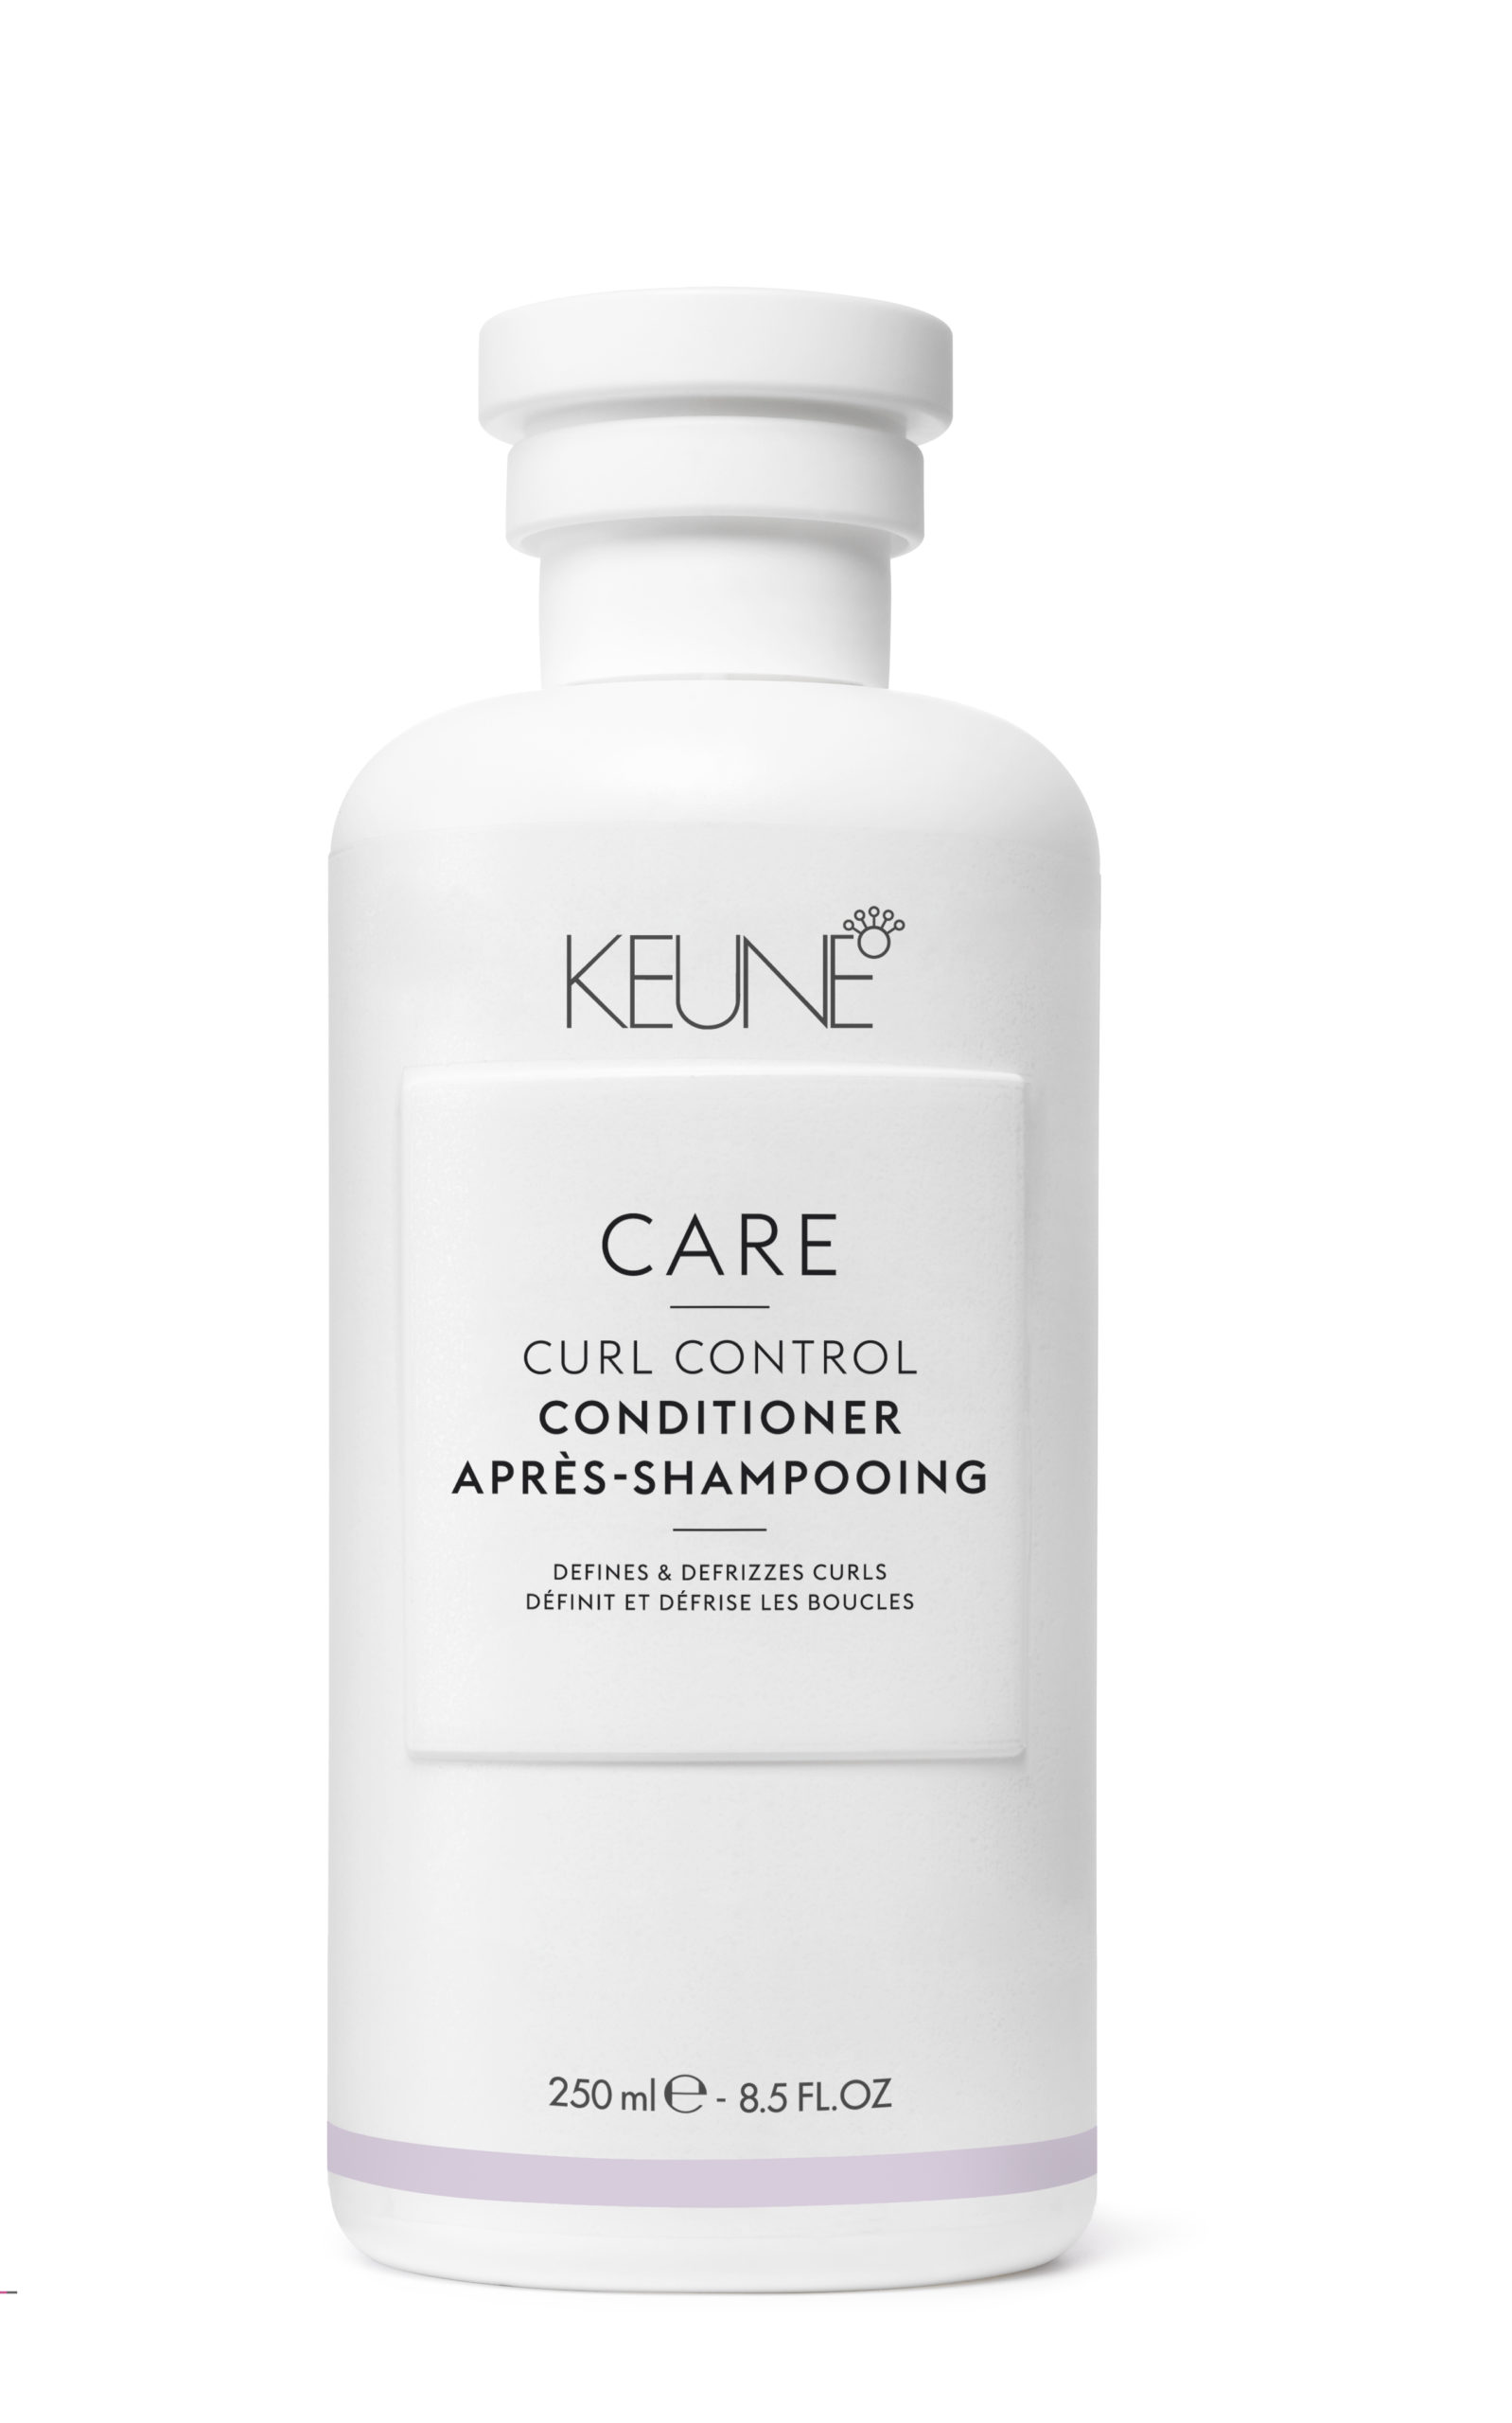 Care-Curl-Control-Conditioner-250ml-def-highres